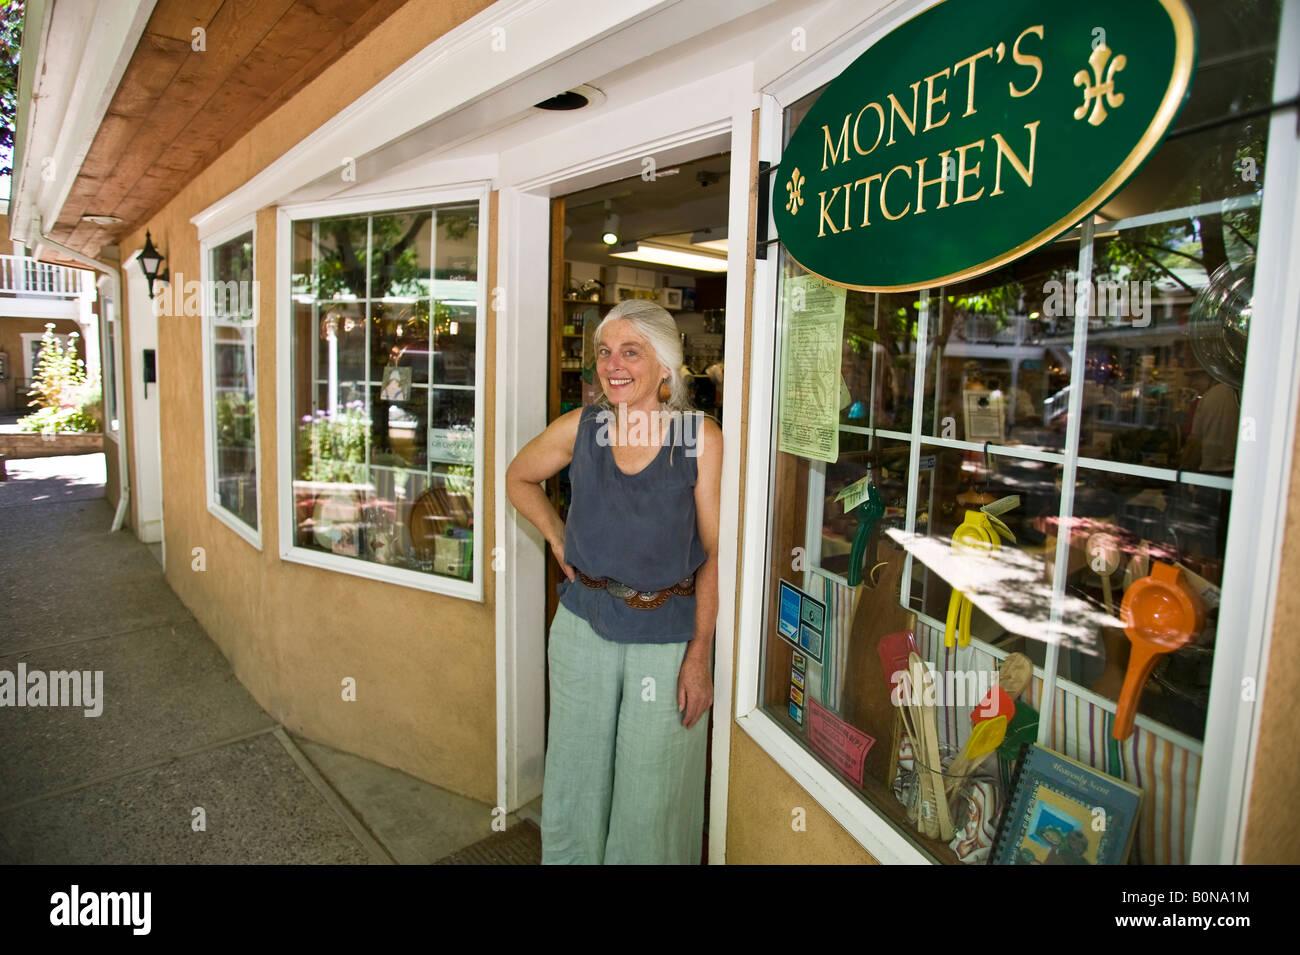 Portrait of female sales person in kitchen accessory store. - Stock Image